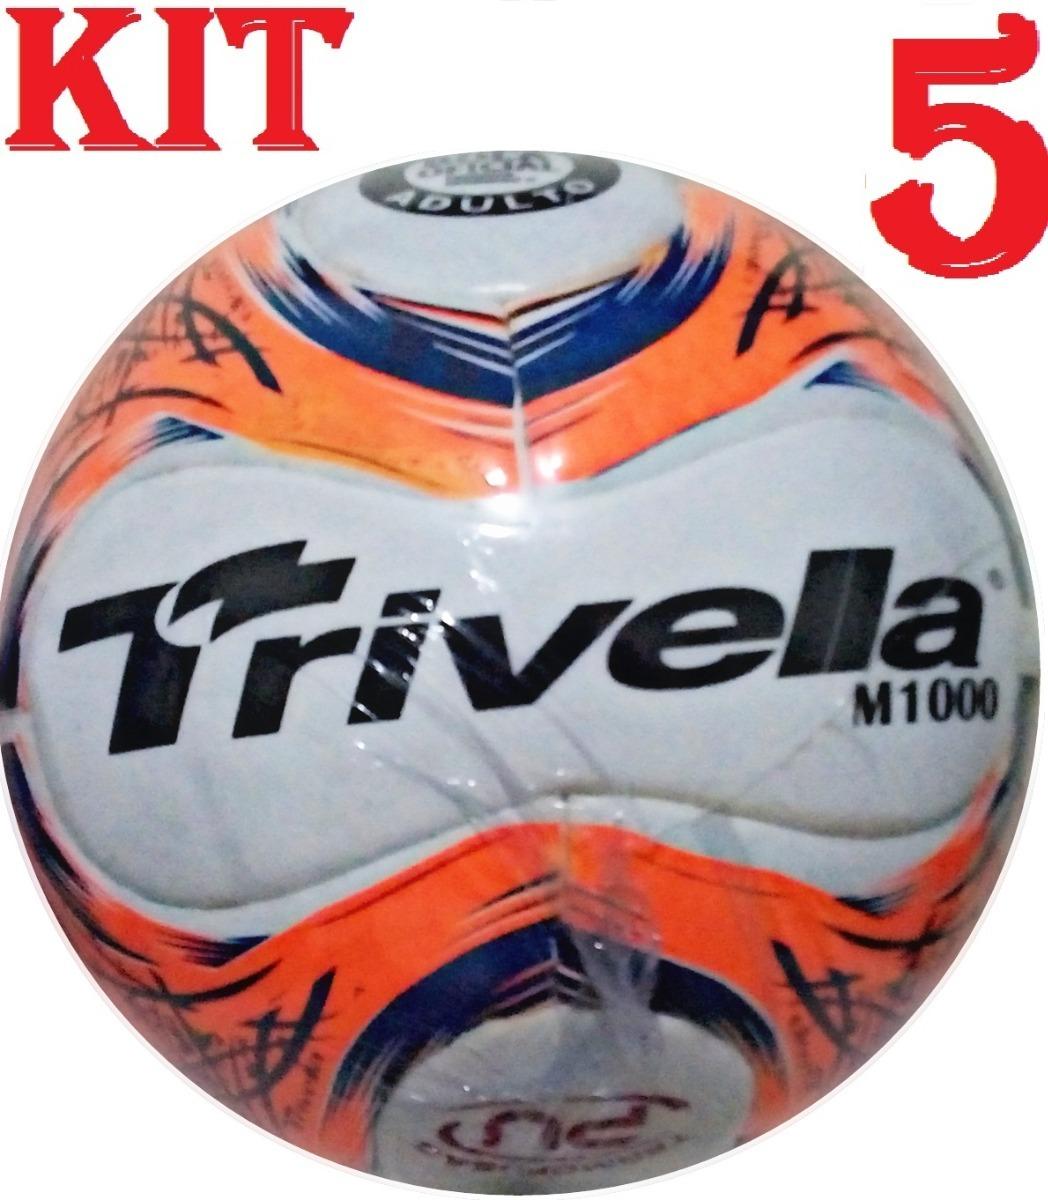 Kit 5 Bolas De Futsal Trivella Original - Brasil Gold - R  300 2016a3018998d